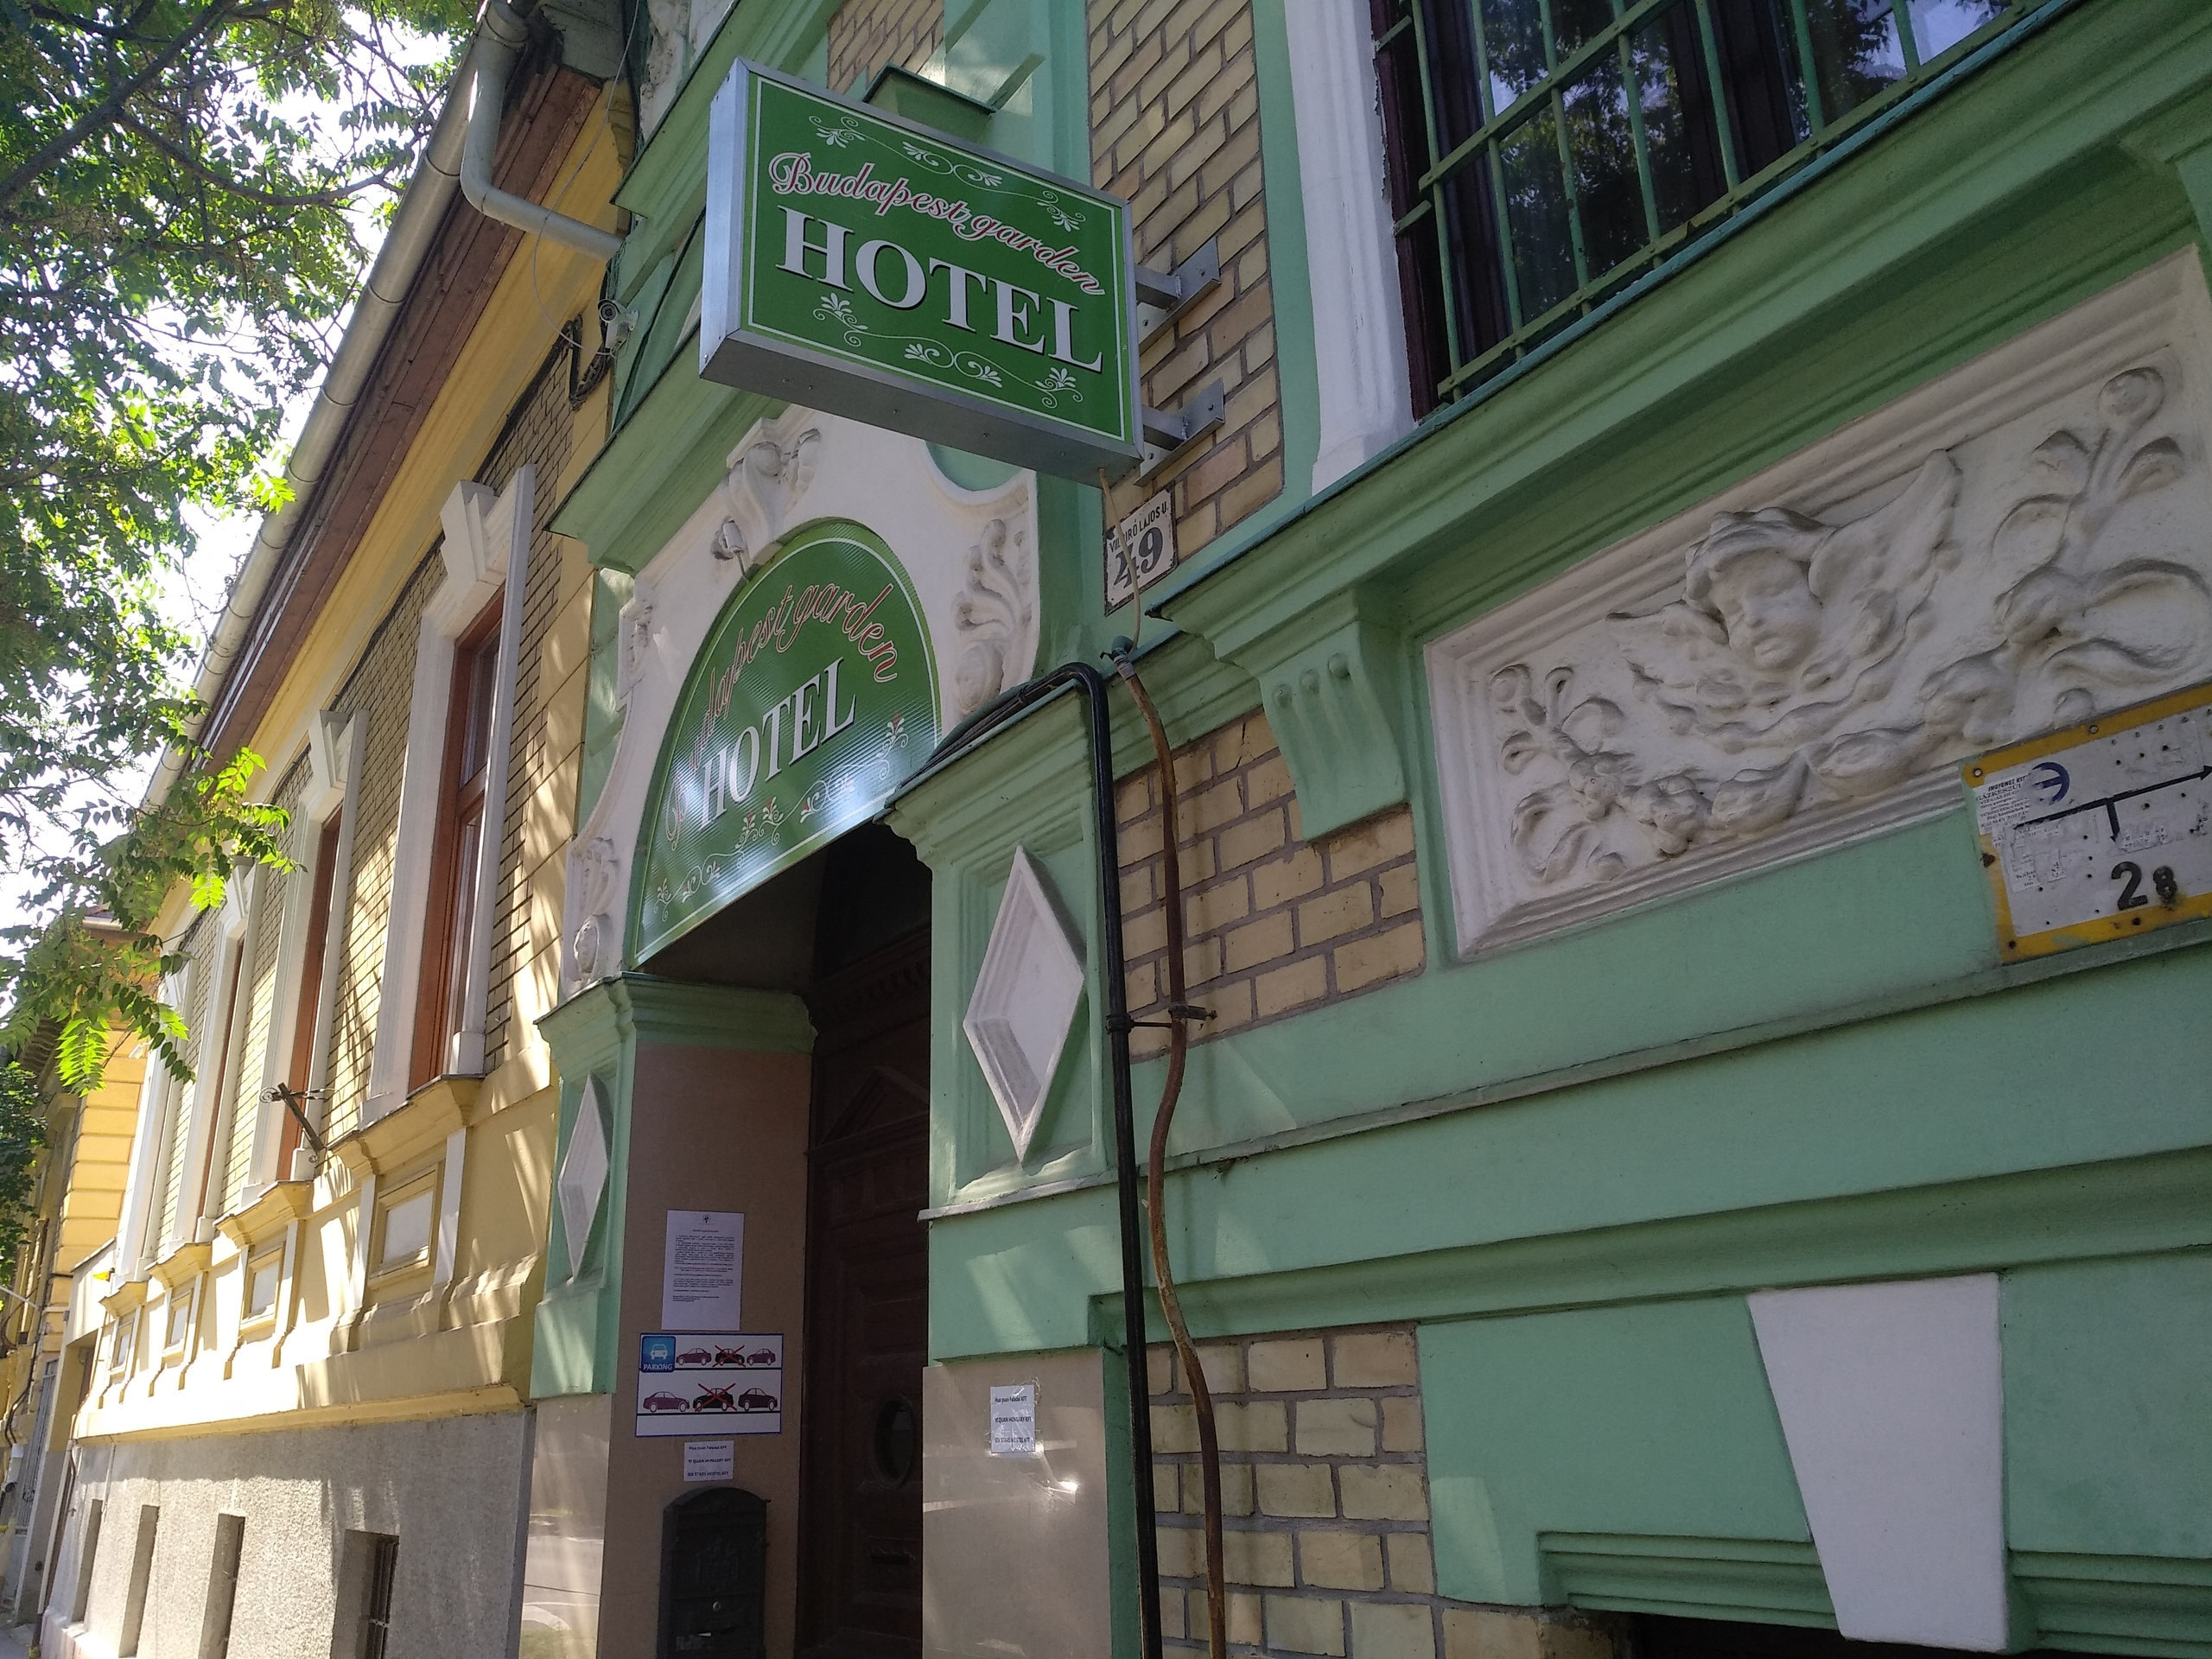 Budapest Garden Hotel - за острыми оущениями, сюда!